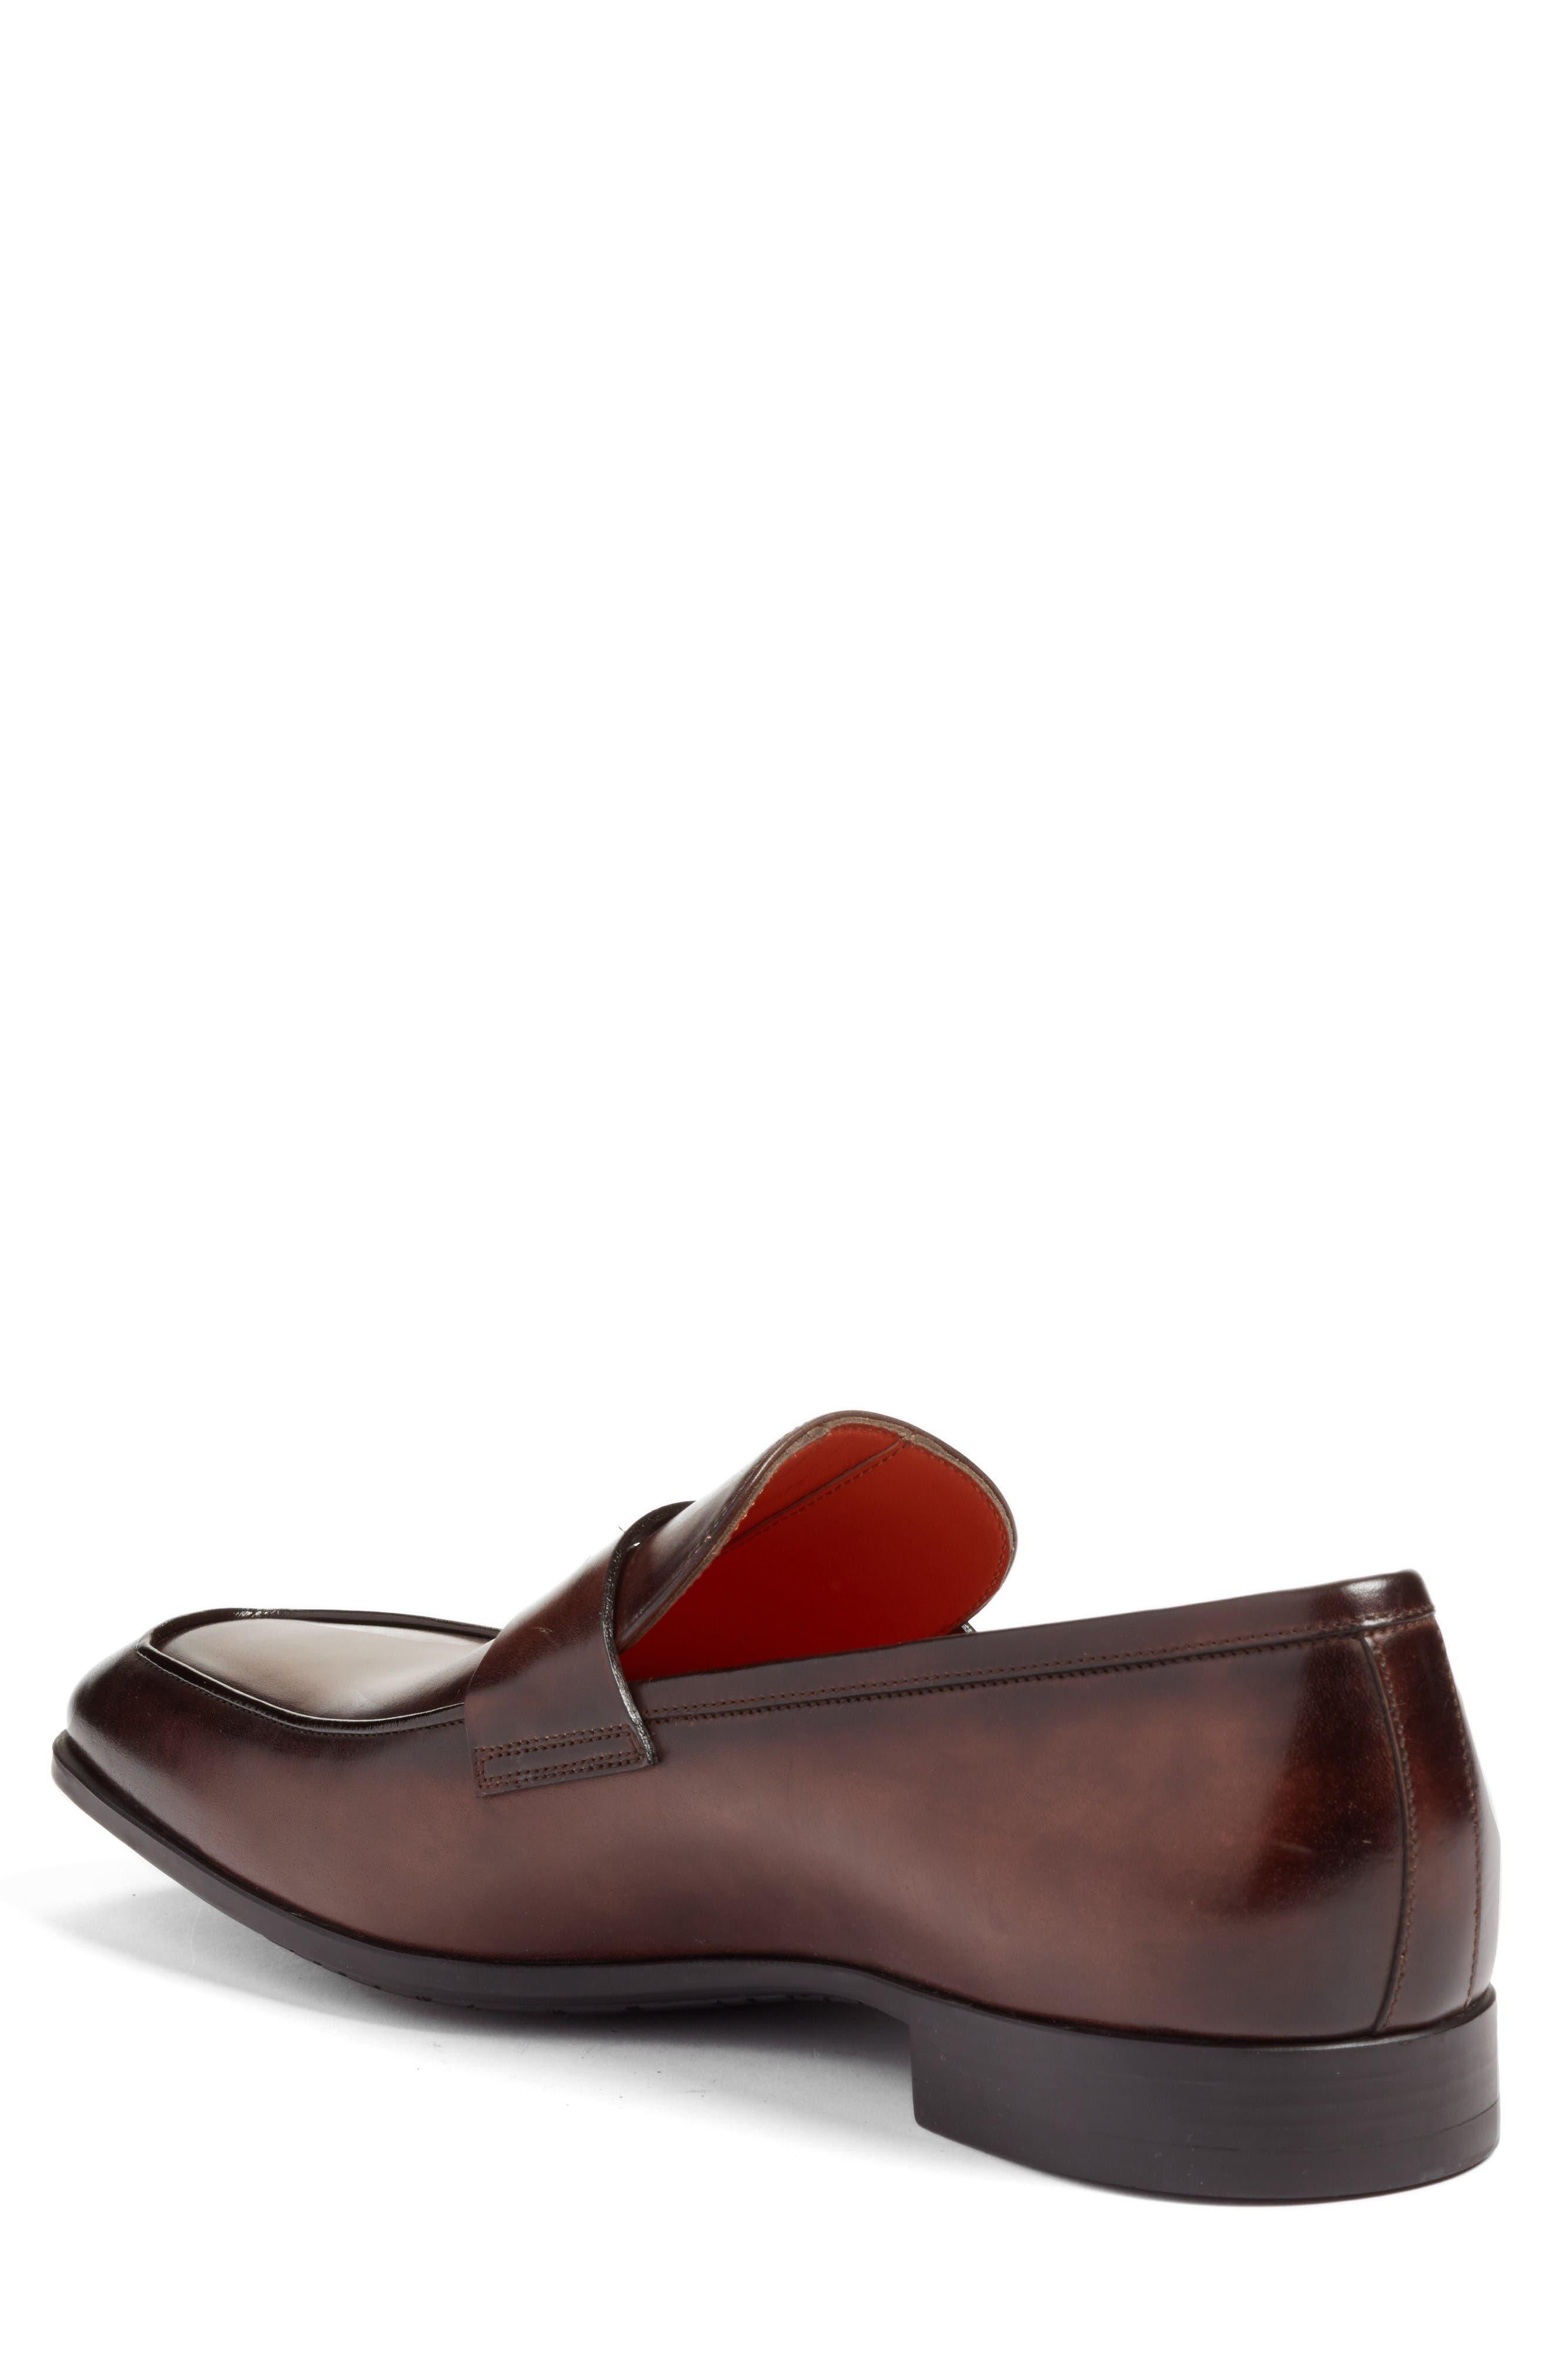 431e7b9ce2c Santoni Designer Loafers for Men  Penny